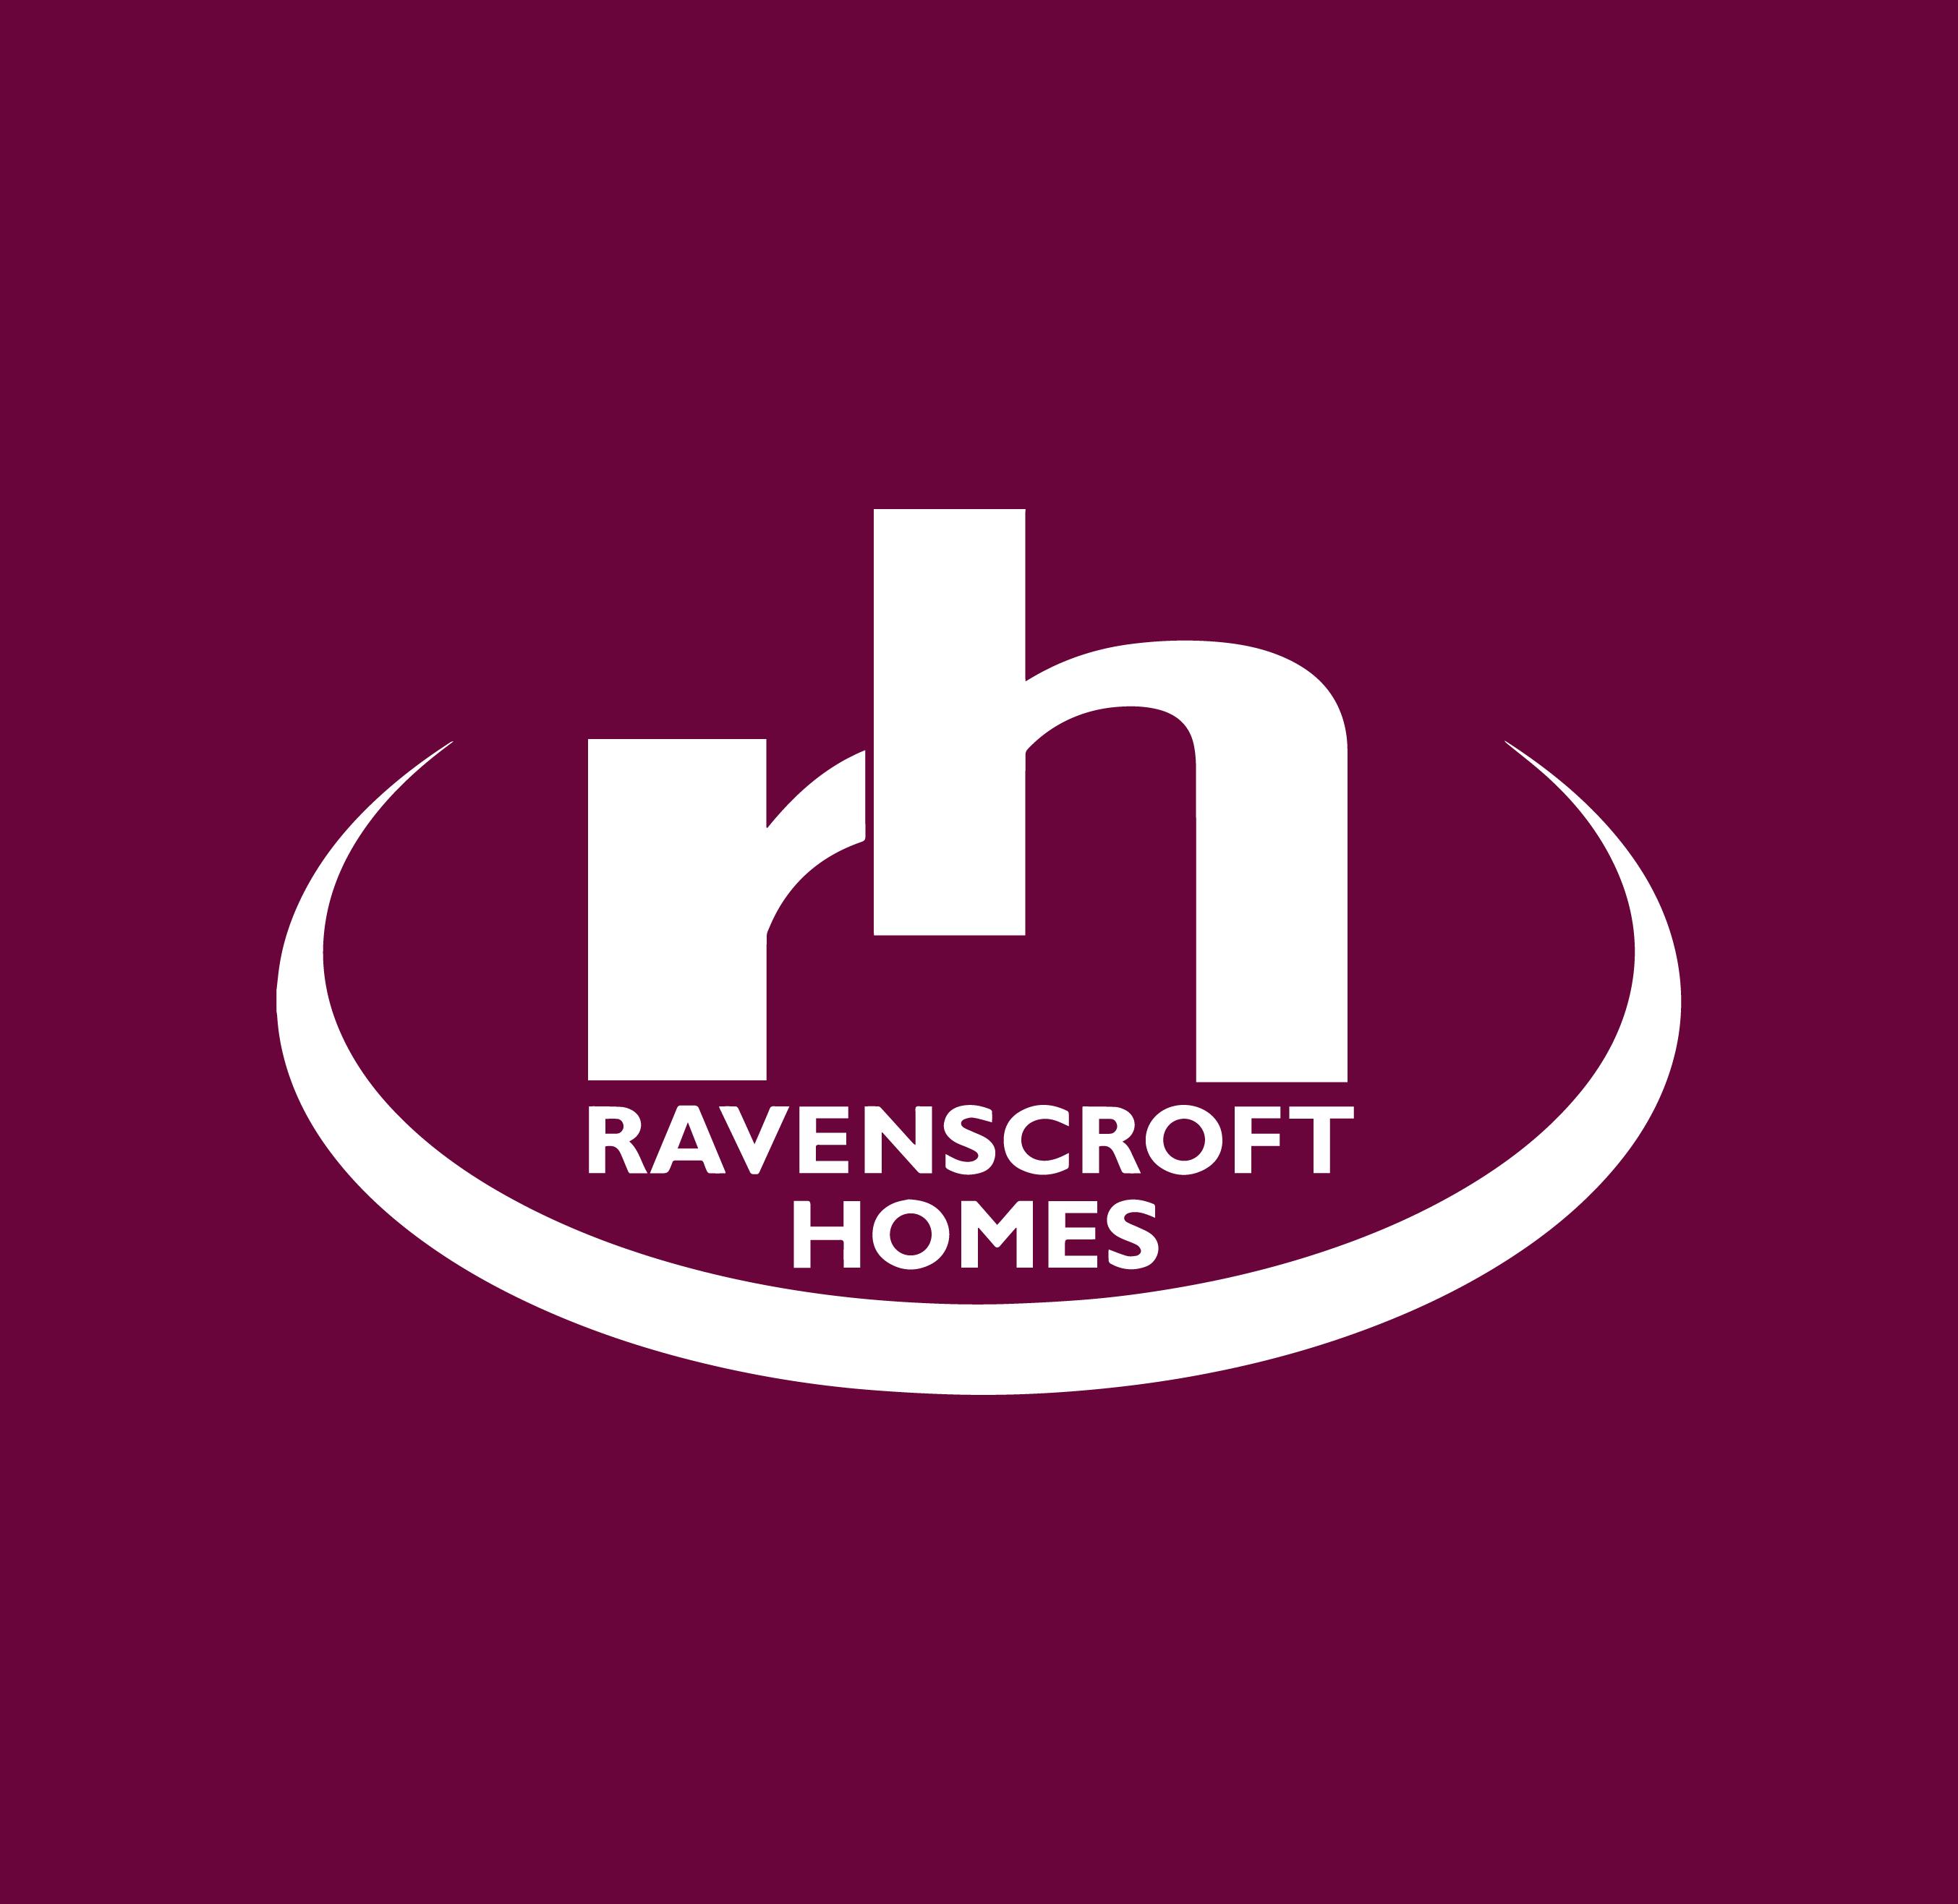 Ravenscroft Homes